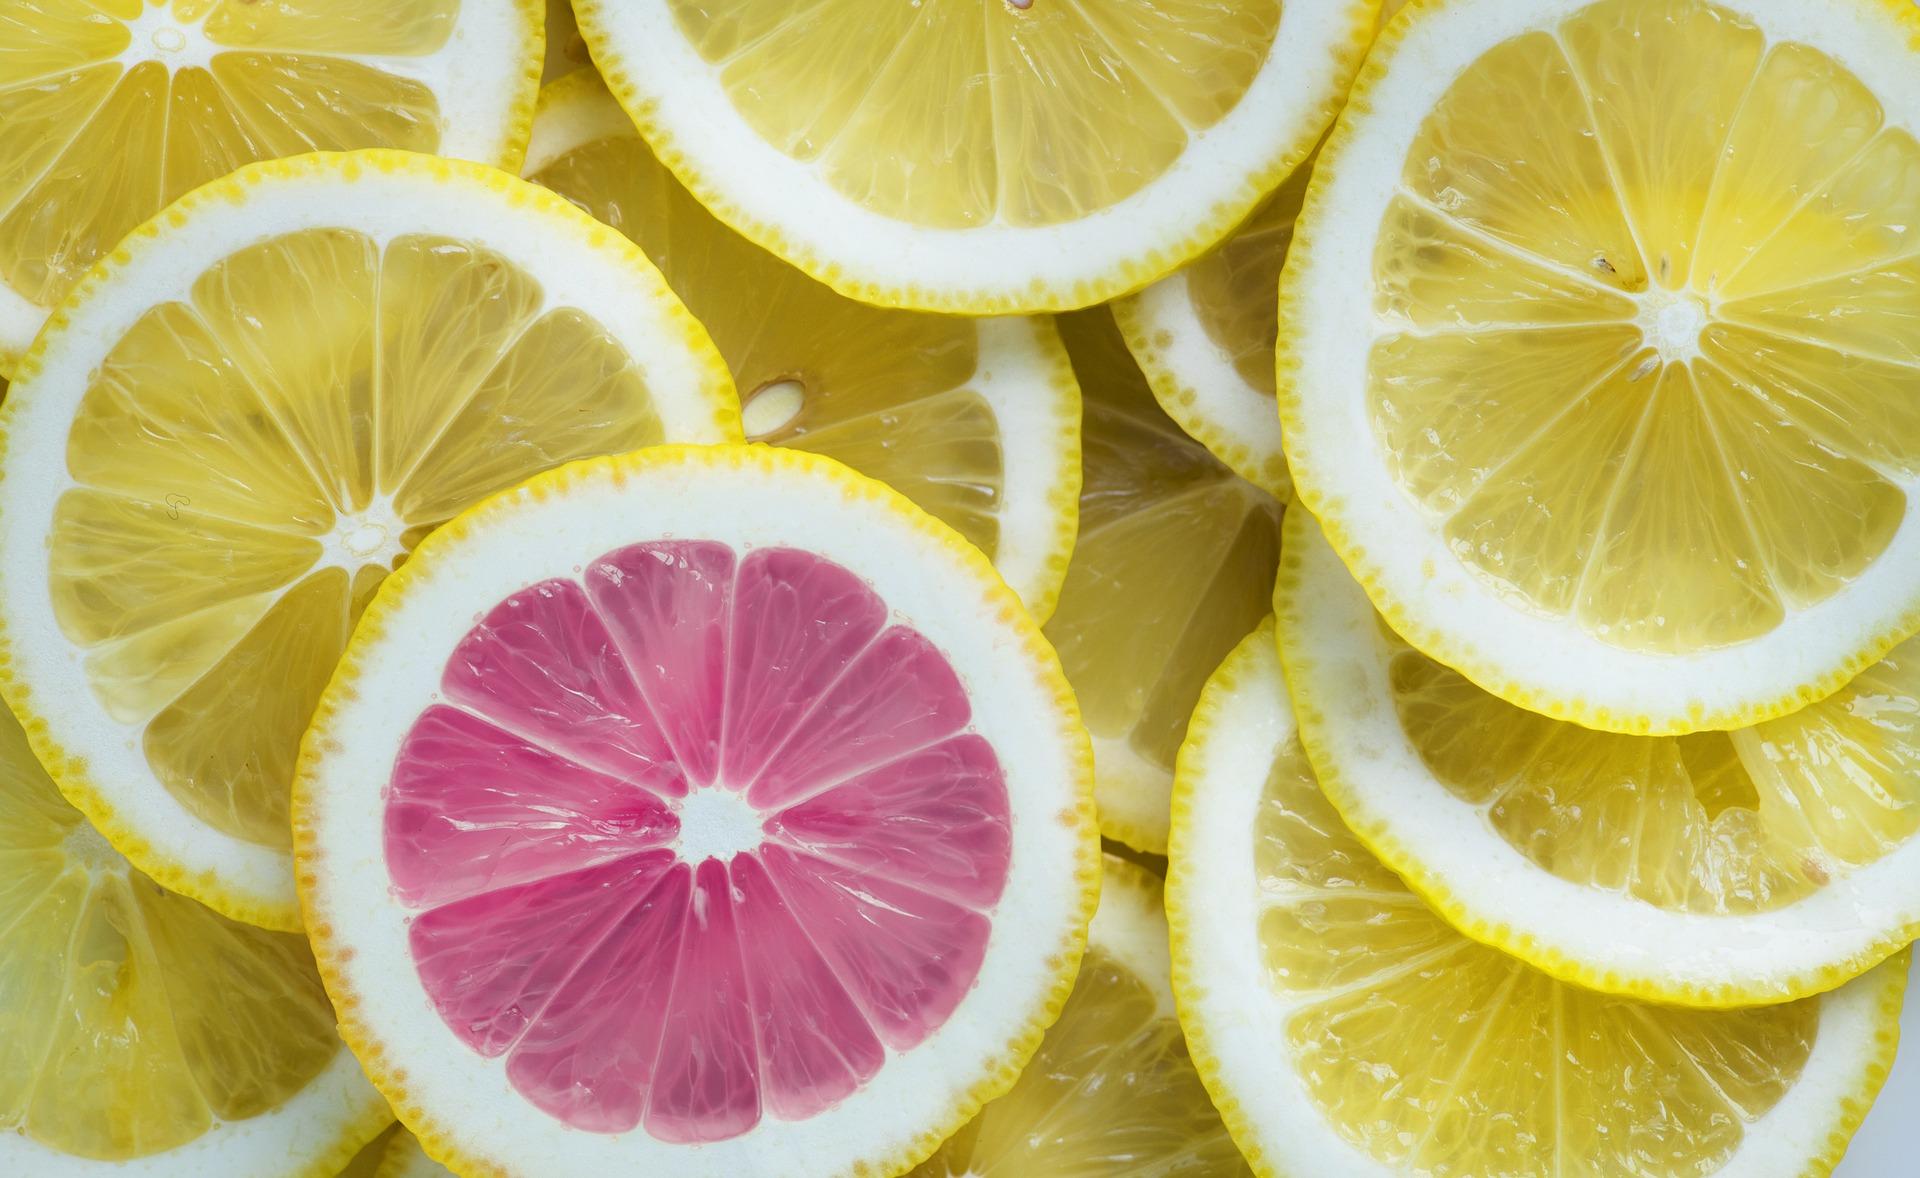 Limonene is found in lemons